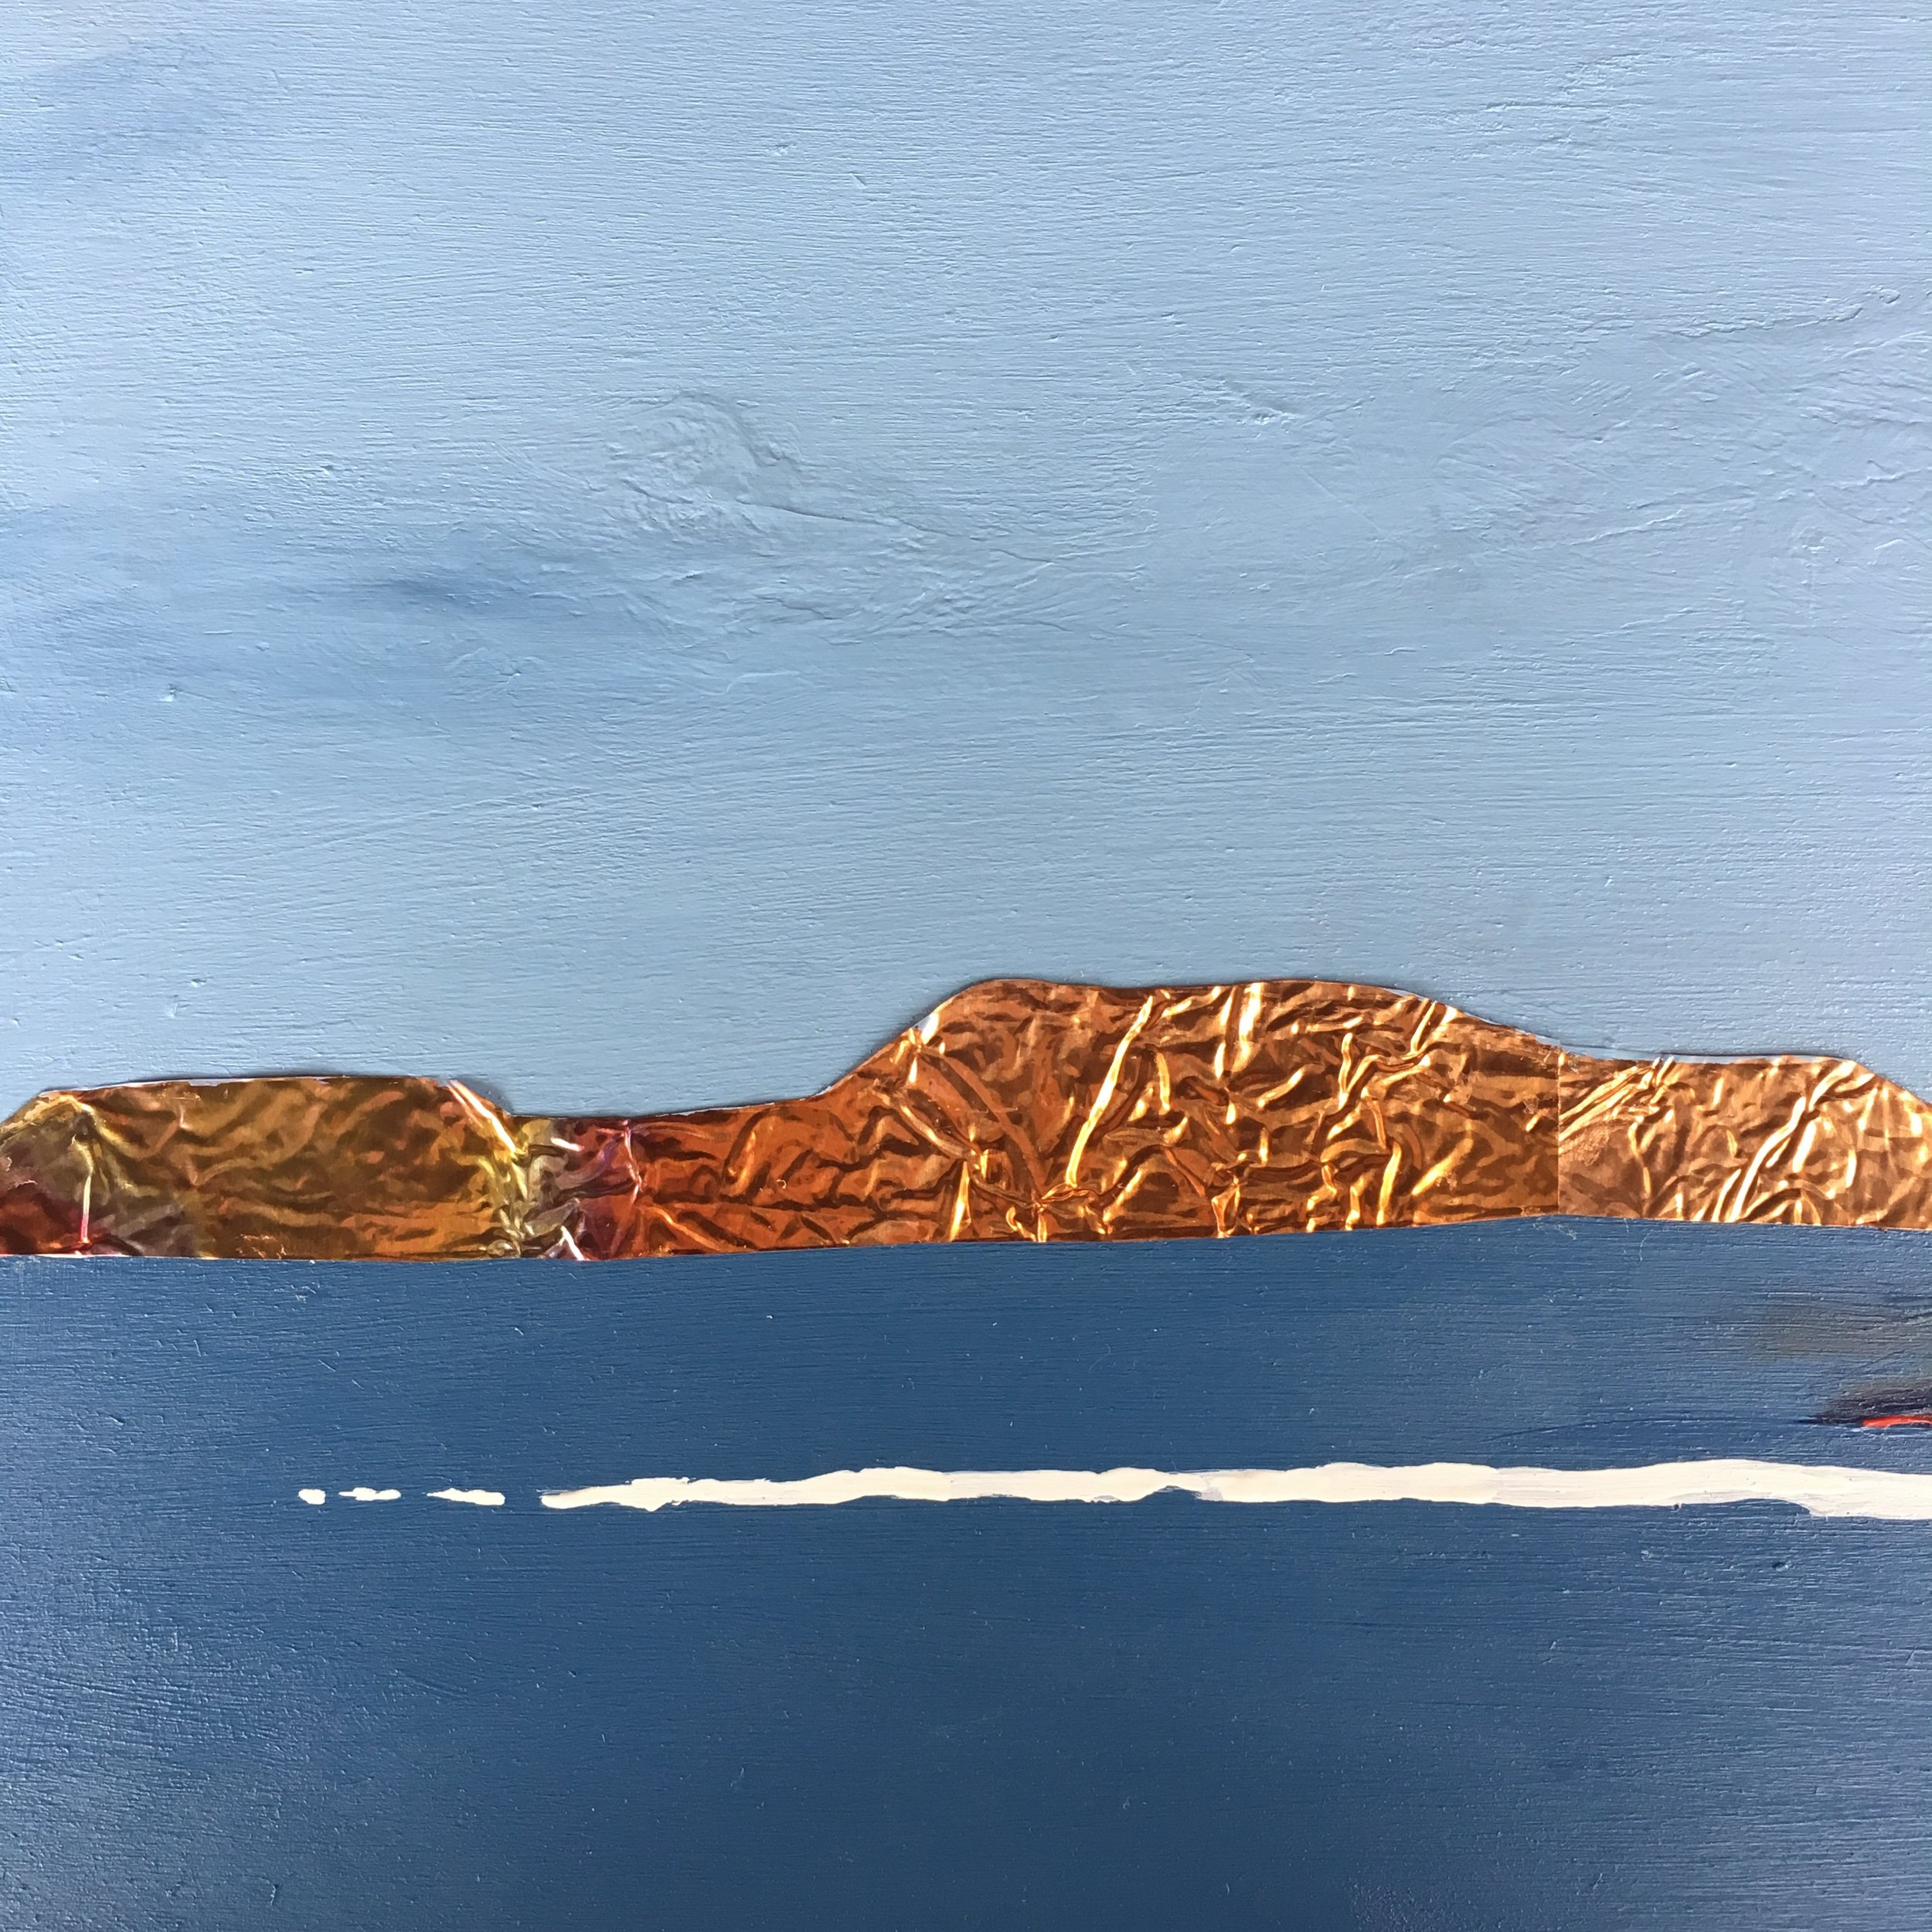 "Sleeping Giant 1 Acrylic and copper on wood panel - 20""x20"" For Sale - $250"